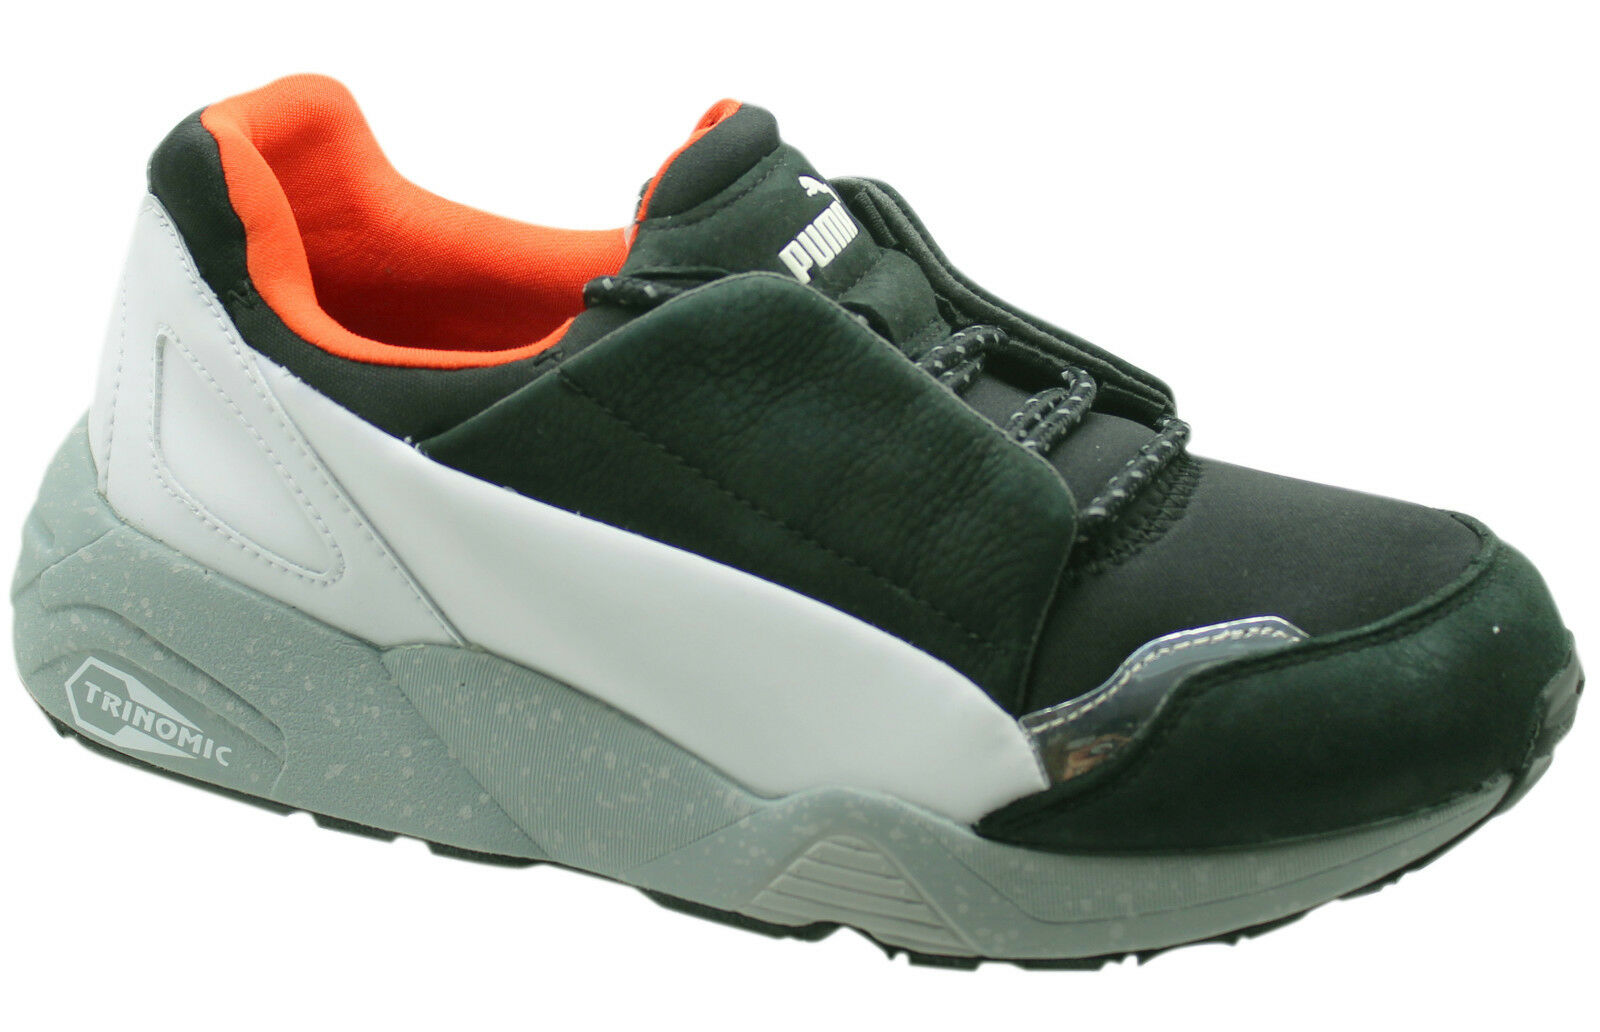 Puma Trinomic MCQ Alexander McQueen Lace Black Mens Trainers 359508 01 D73